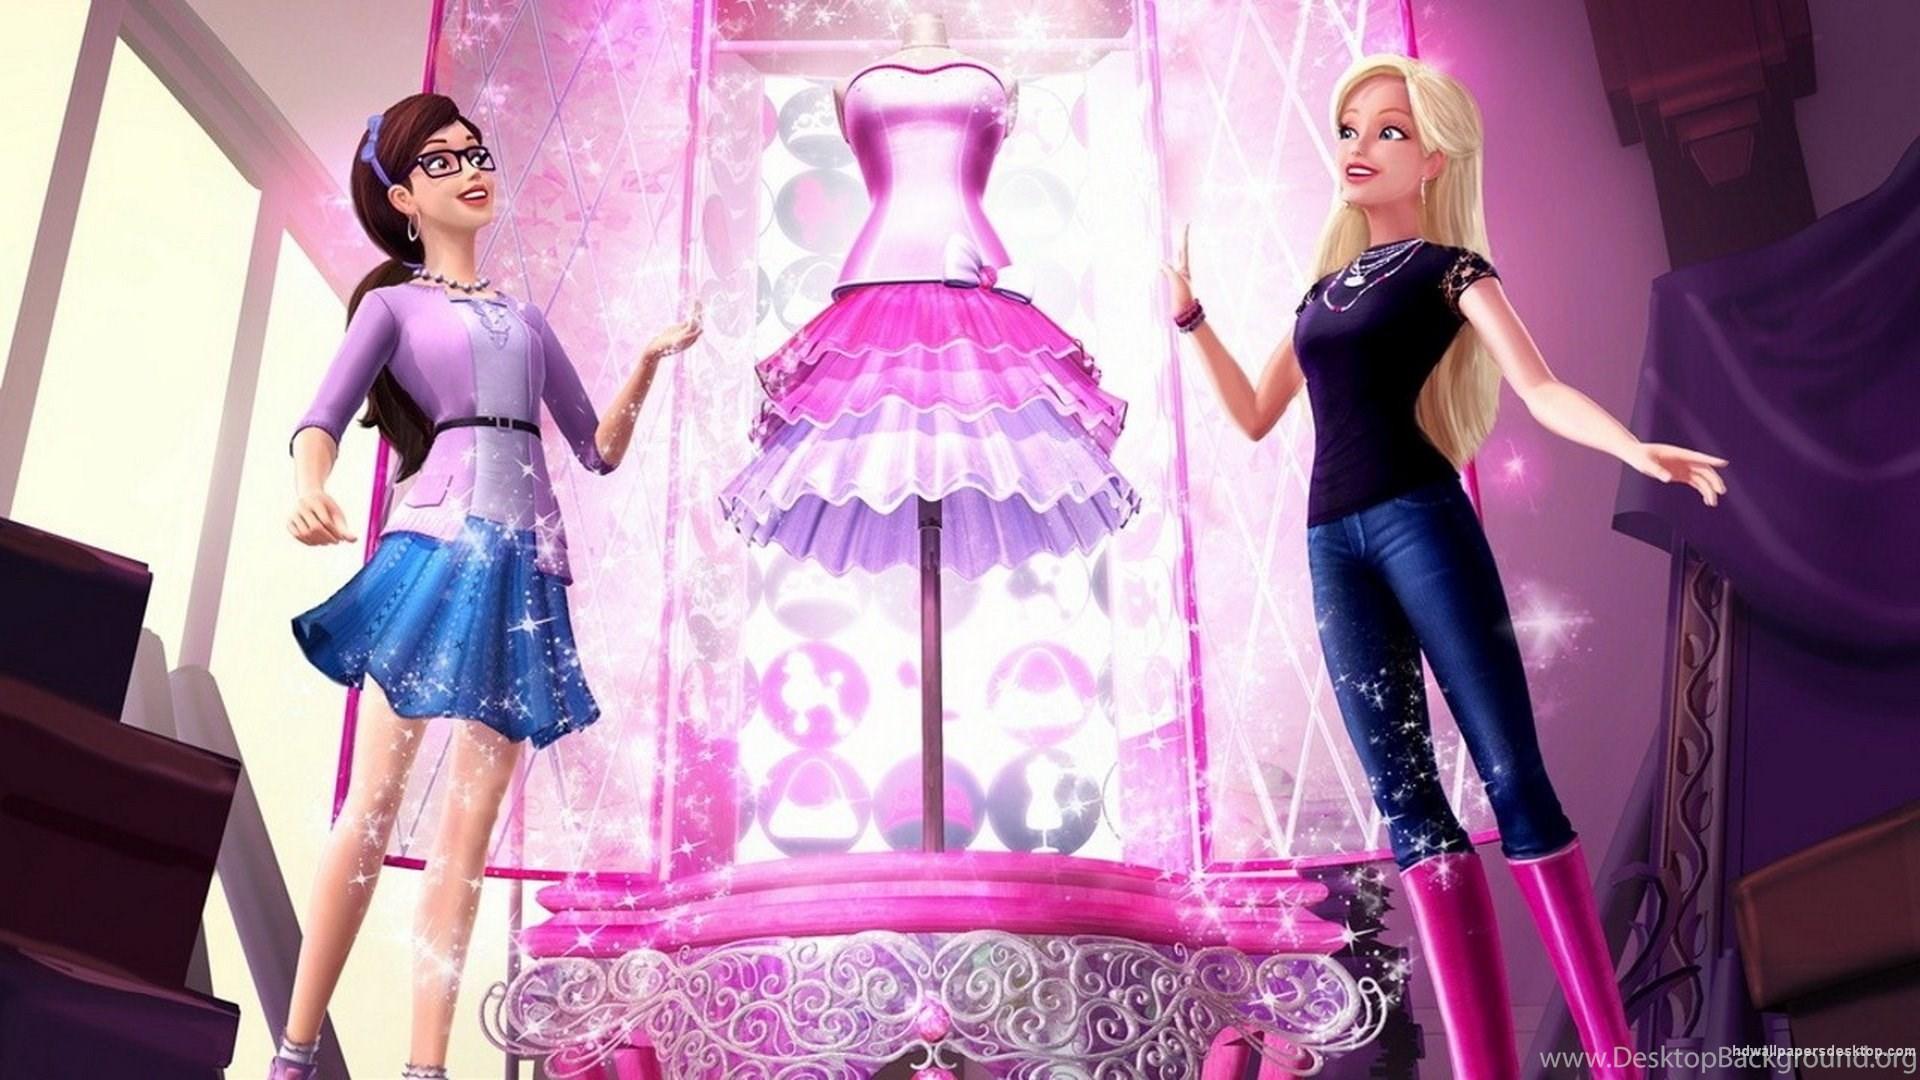 Barbie Wallpaper Hd Desktop Wallpapers Wallpaper Barbie Bergerak